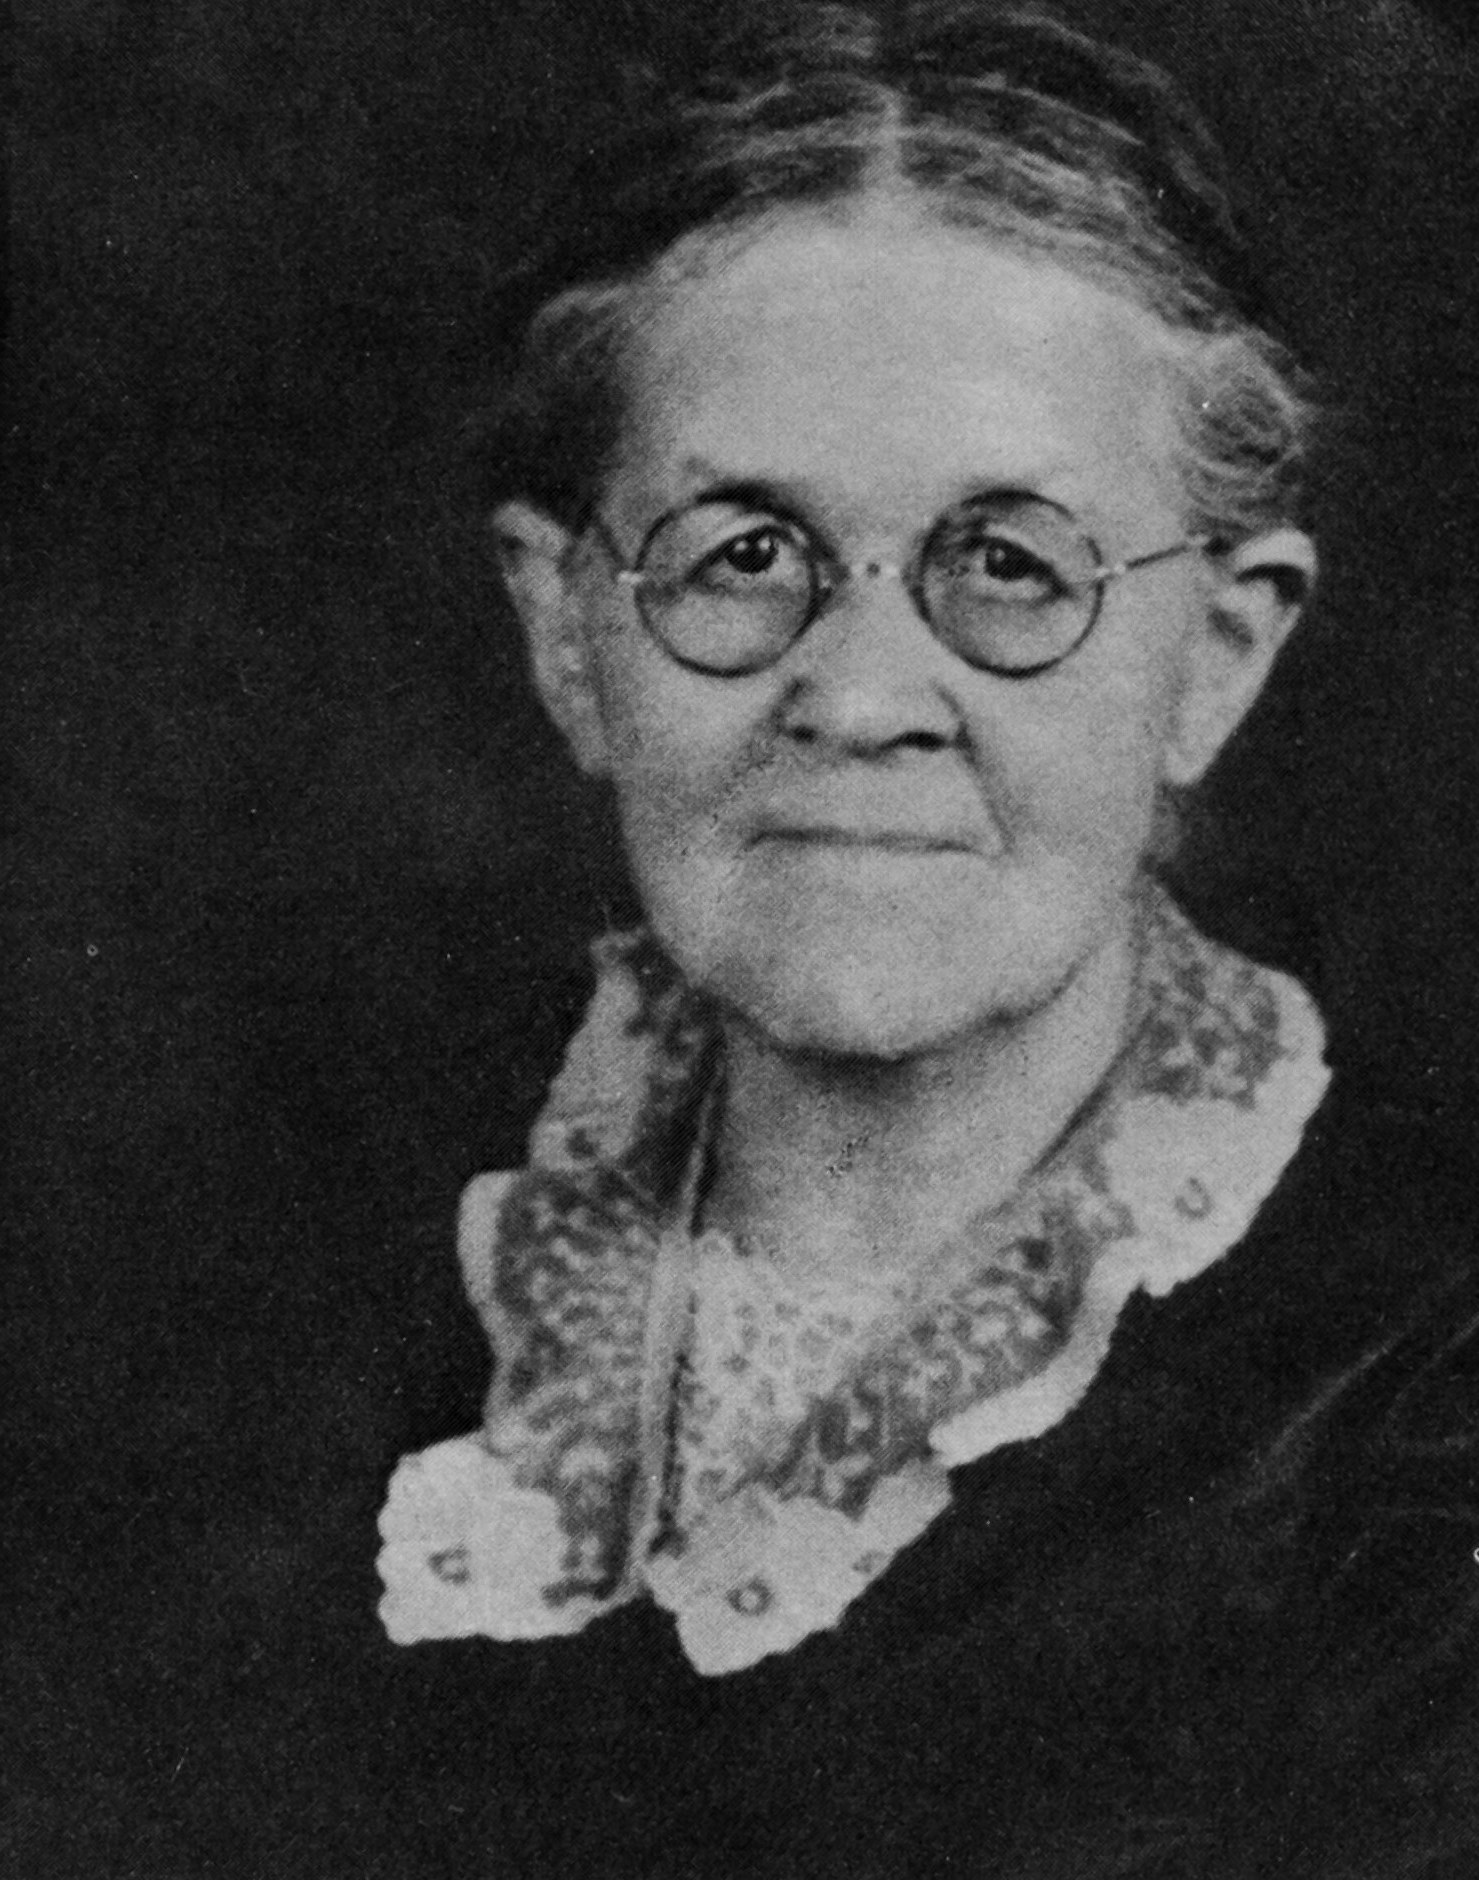 richards-grandmother-margaret-bolden-wilson